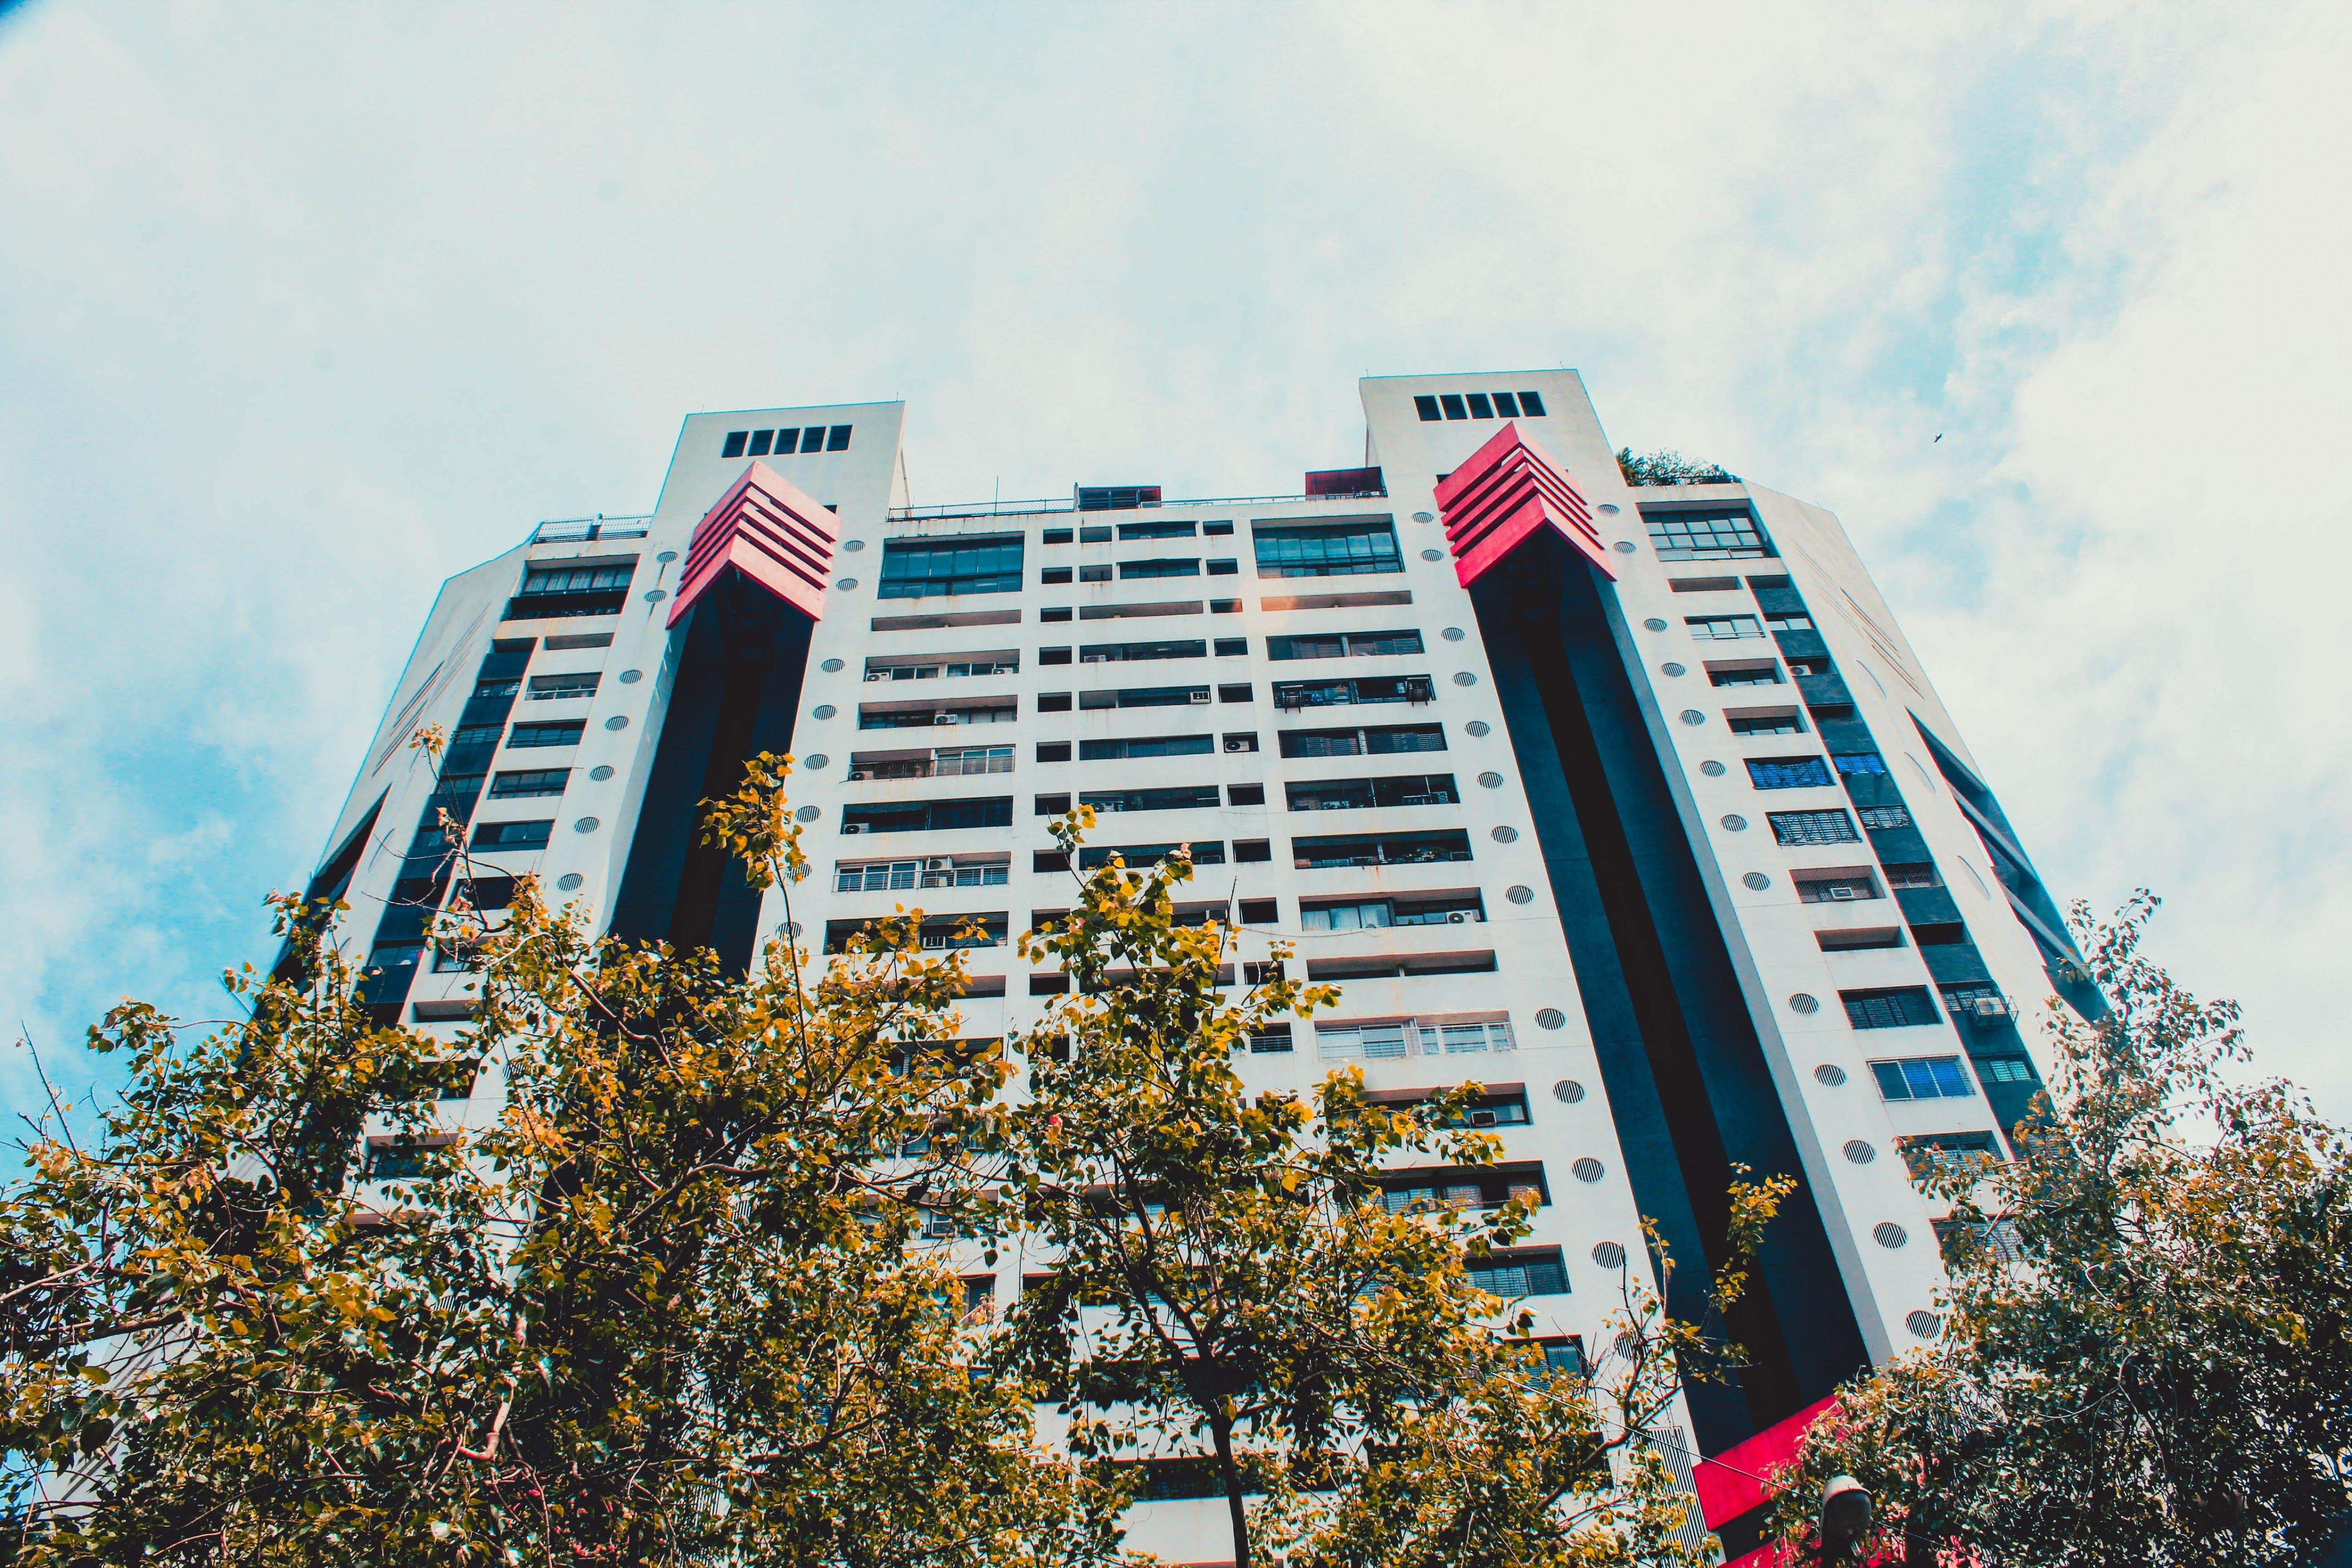 Kostenloses Stock Foto zu apartmentgebäude, architekturdesign, buldings, himmel